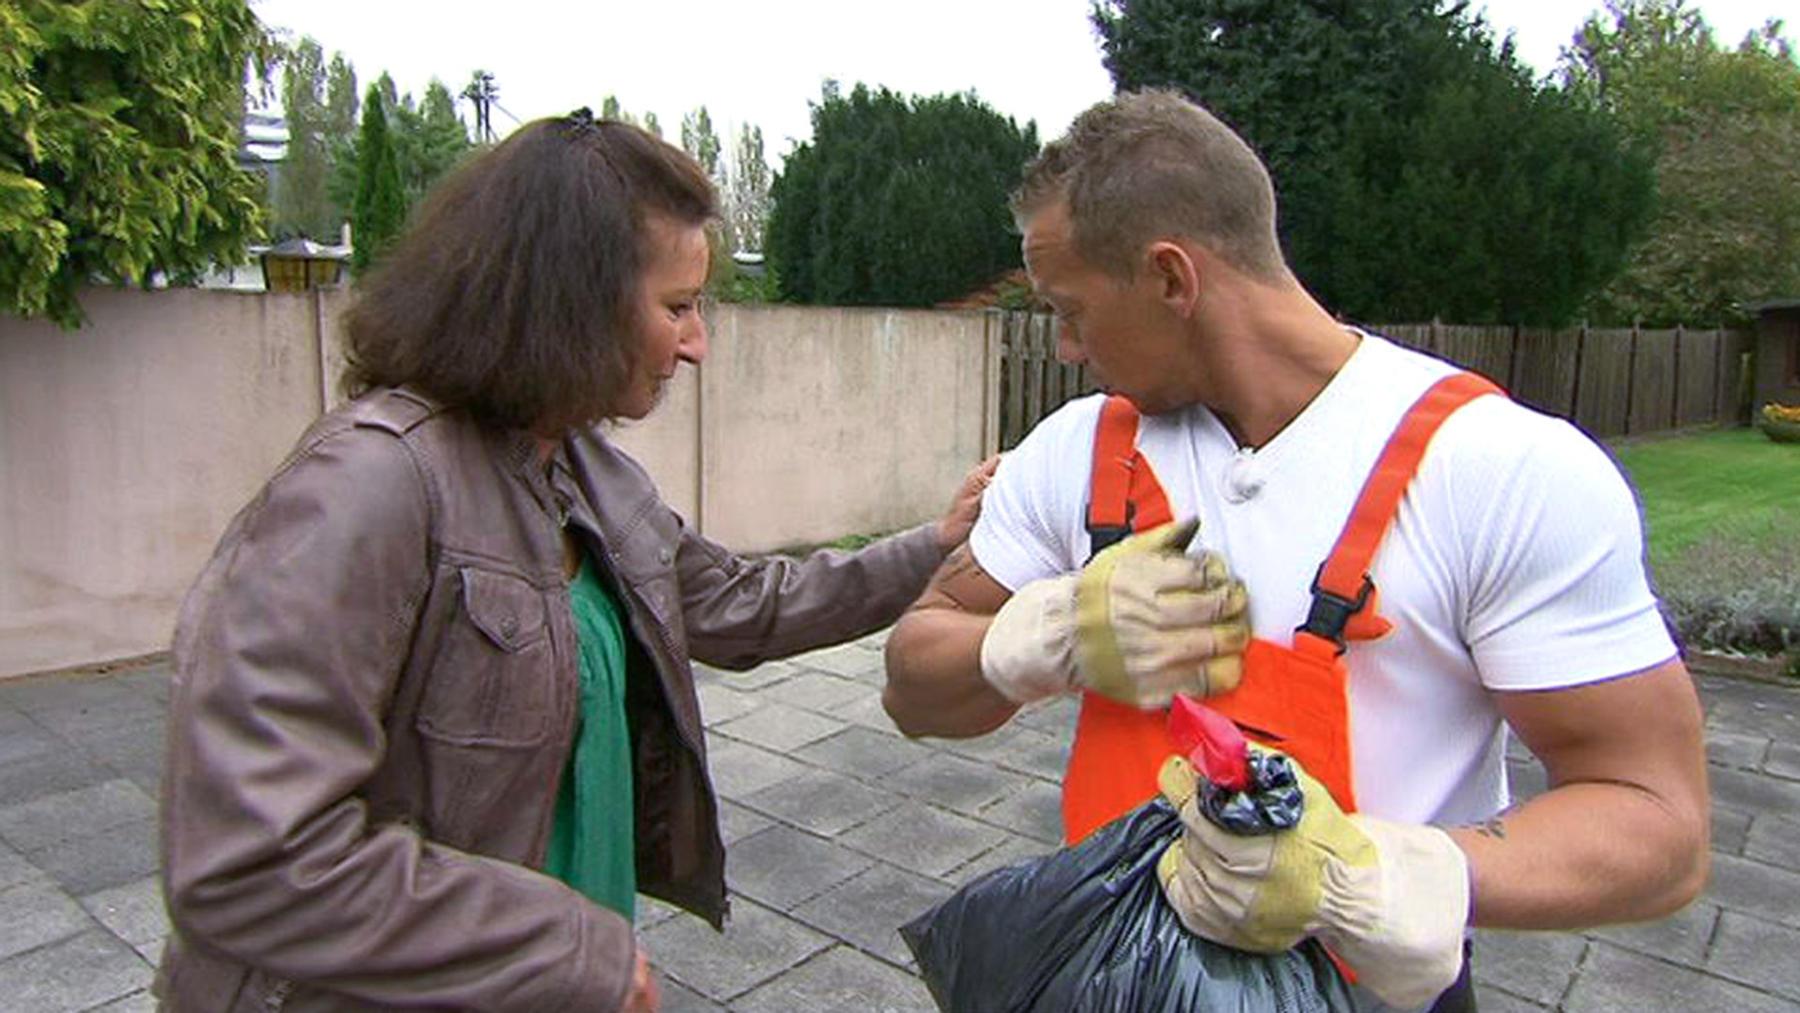 Müllmann will unbedingt Frau kennen lernen